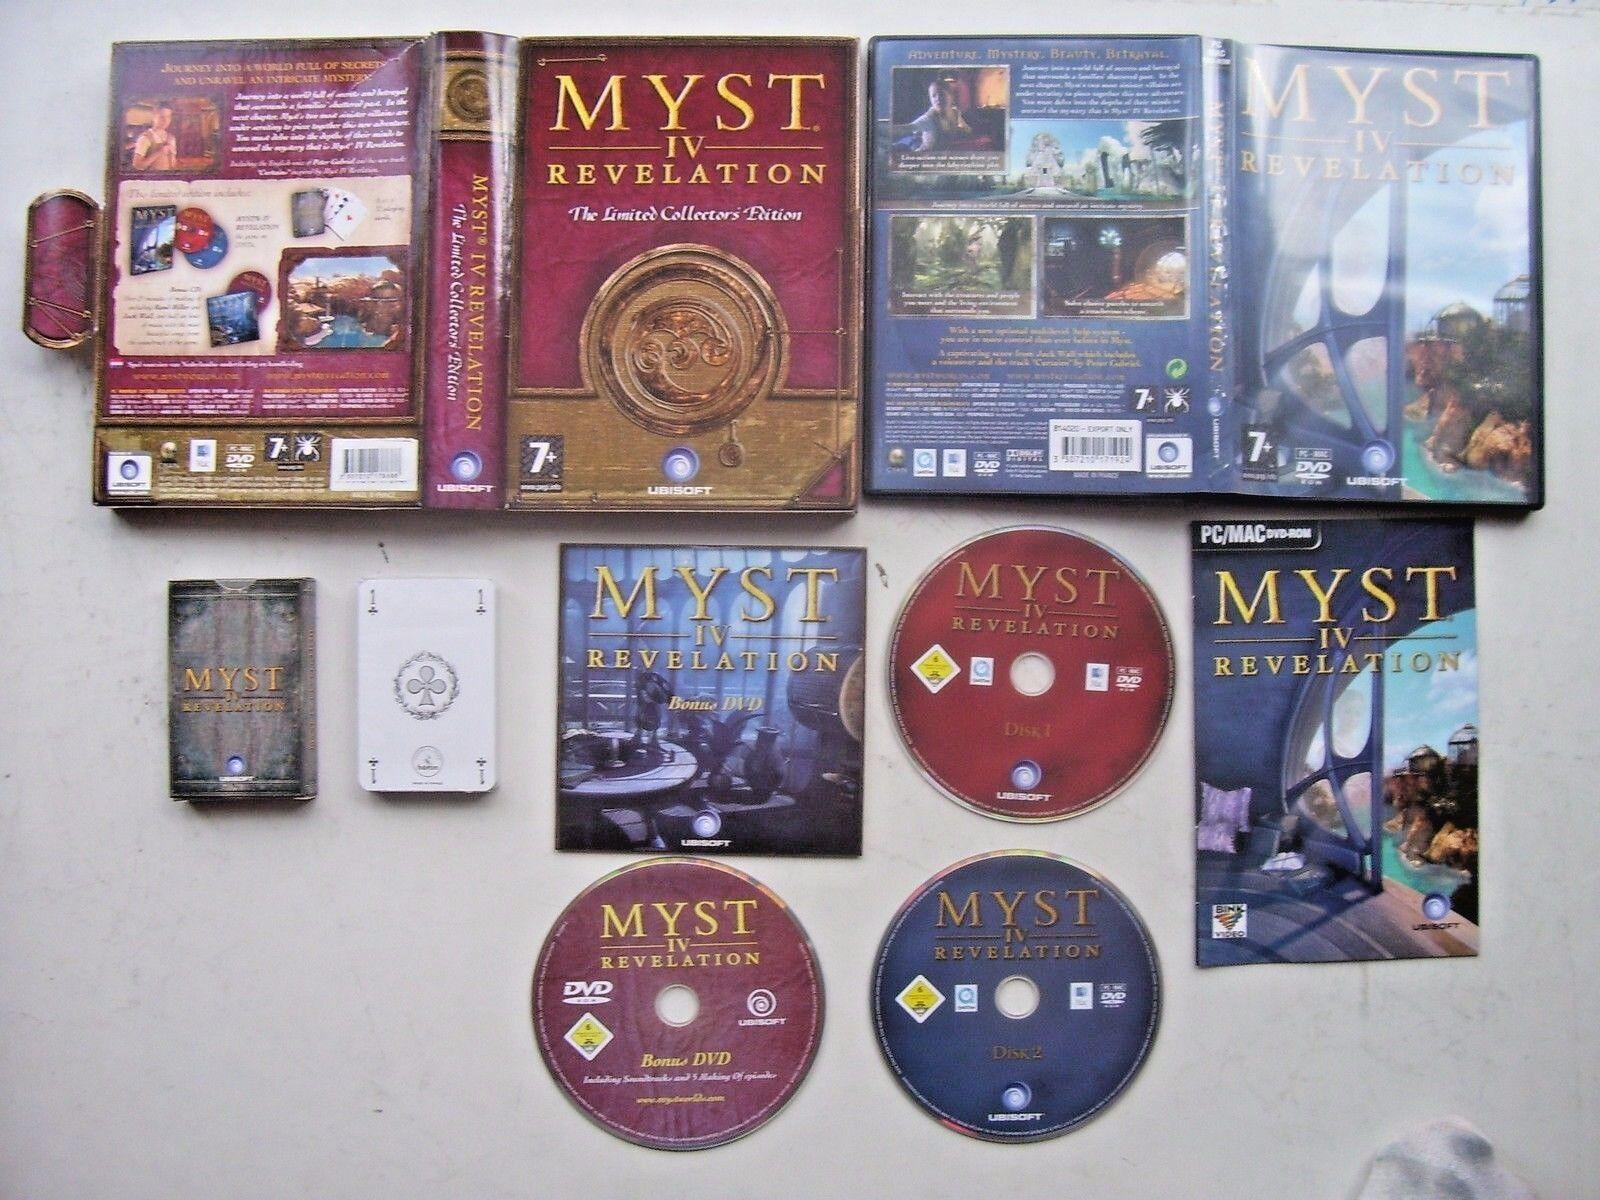 Myst 4 Revelation (PC Game Windows 2004) - Limited Big Box Edition